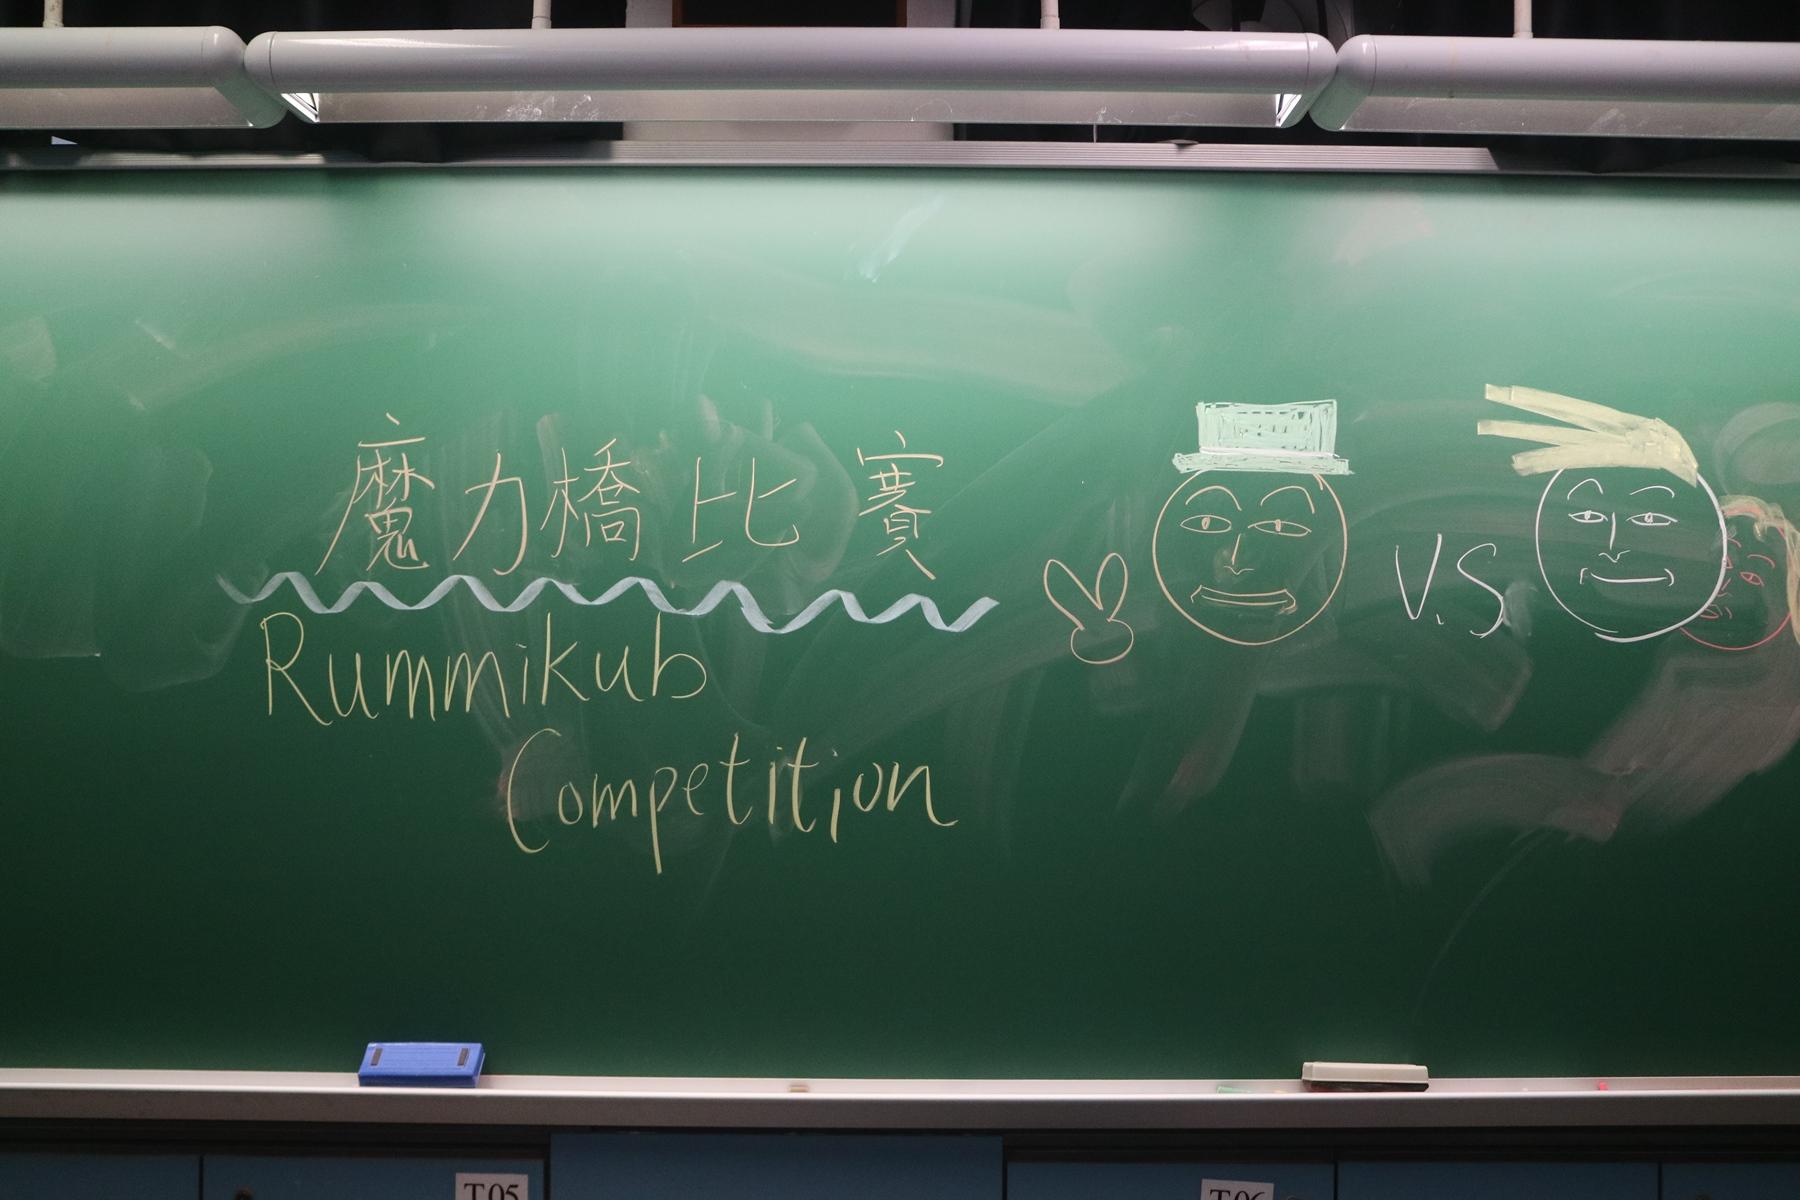 http://npc.edu.hk/sites/default/files/img_8829.jpg